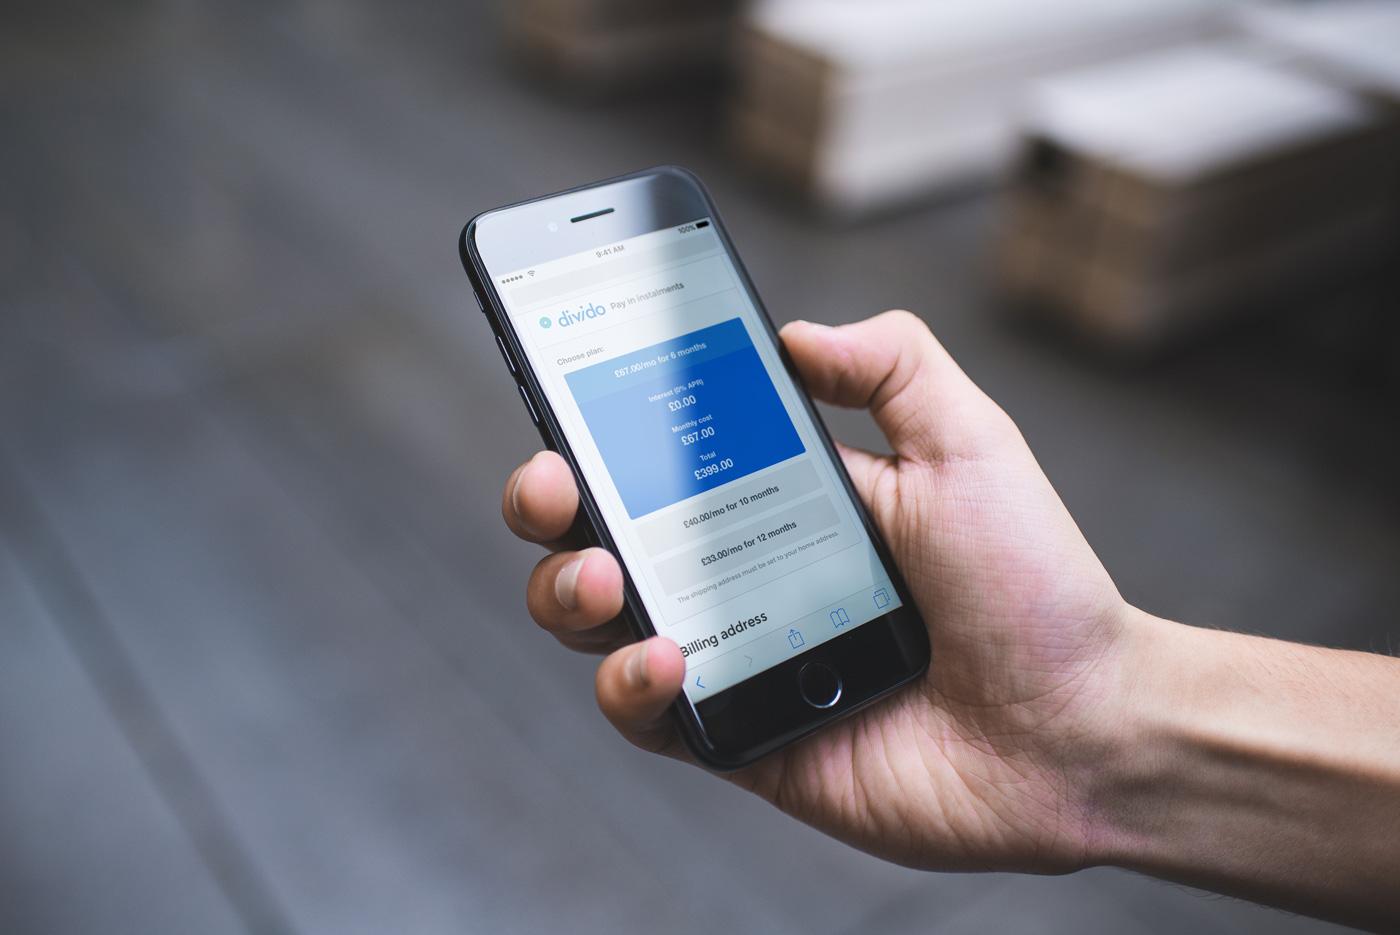 techcrunch.com - Steve O'Hear - Divido, the consumer finance platform, scores $15M Series A